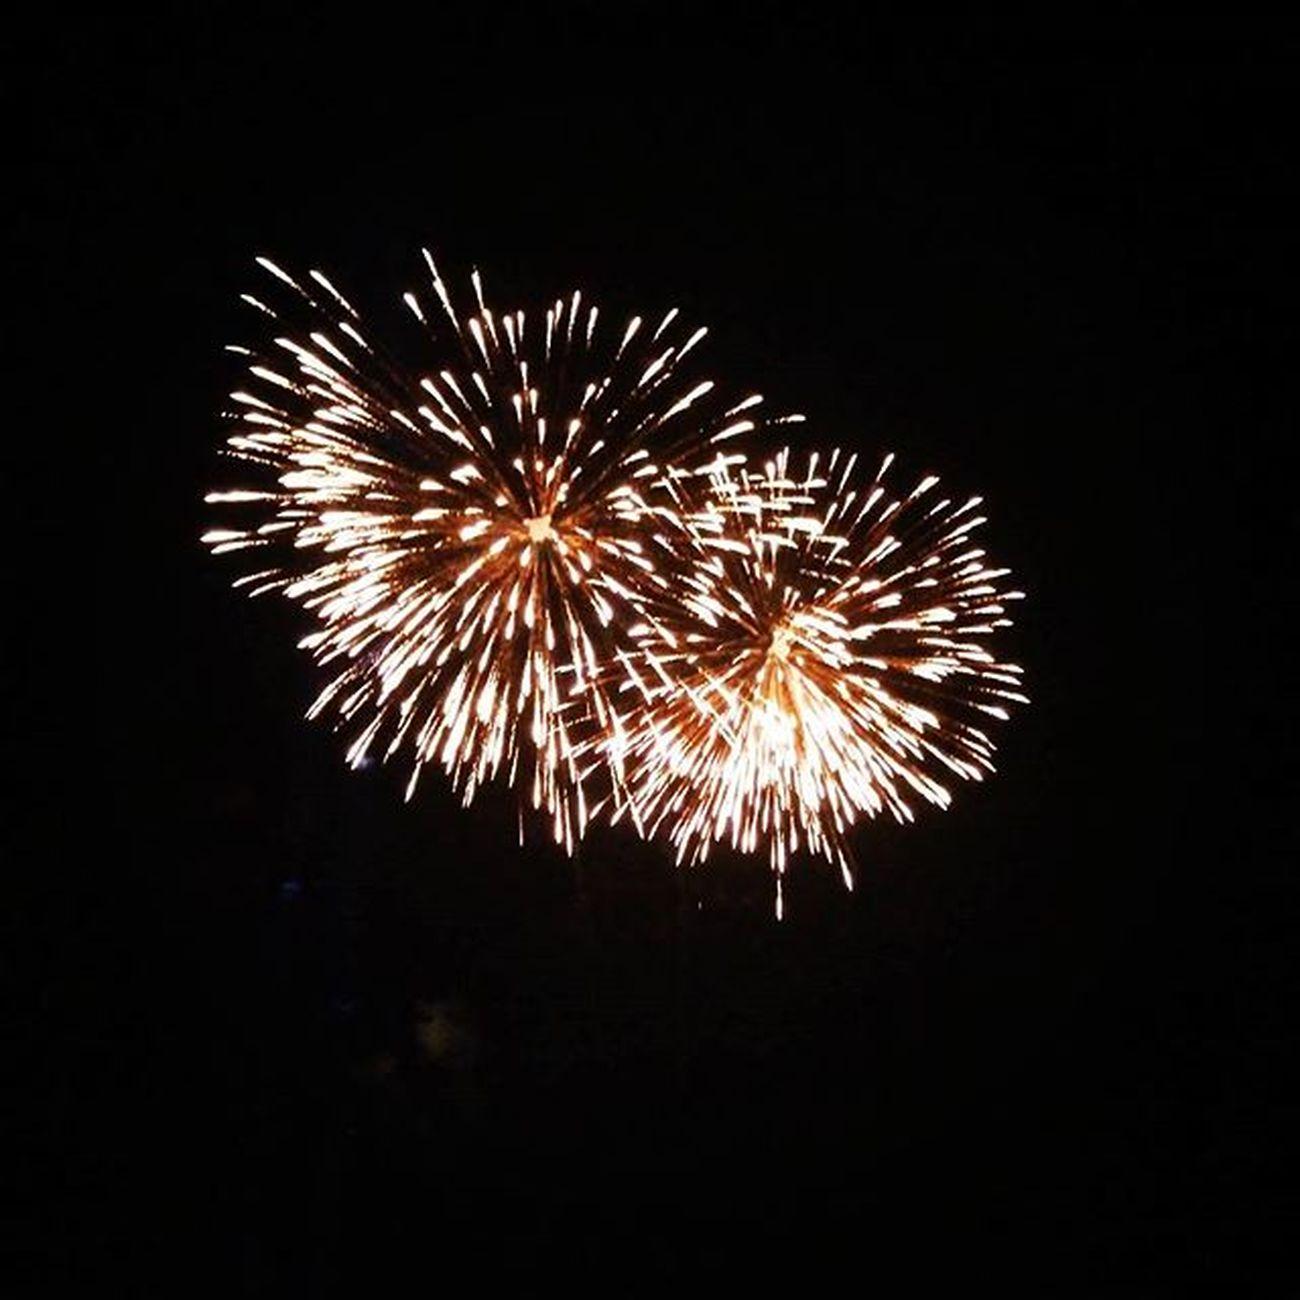 Woov Js Nw Clickd November PreDipawaliBlast BPS Fireworks Yurekaplus Noedit Supab Capture :p Picofdaday Doubbletap Instajoy Instafestival Loveit Kbye GN :* :)